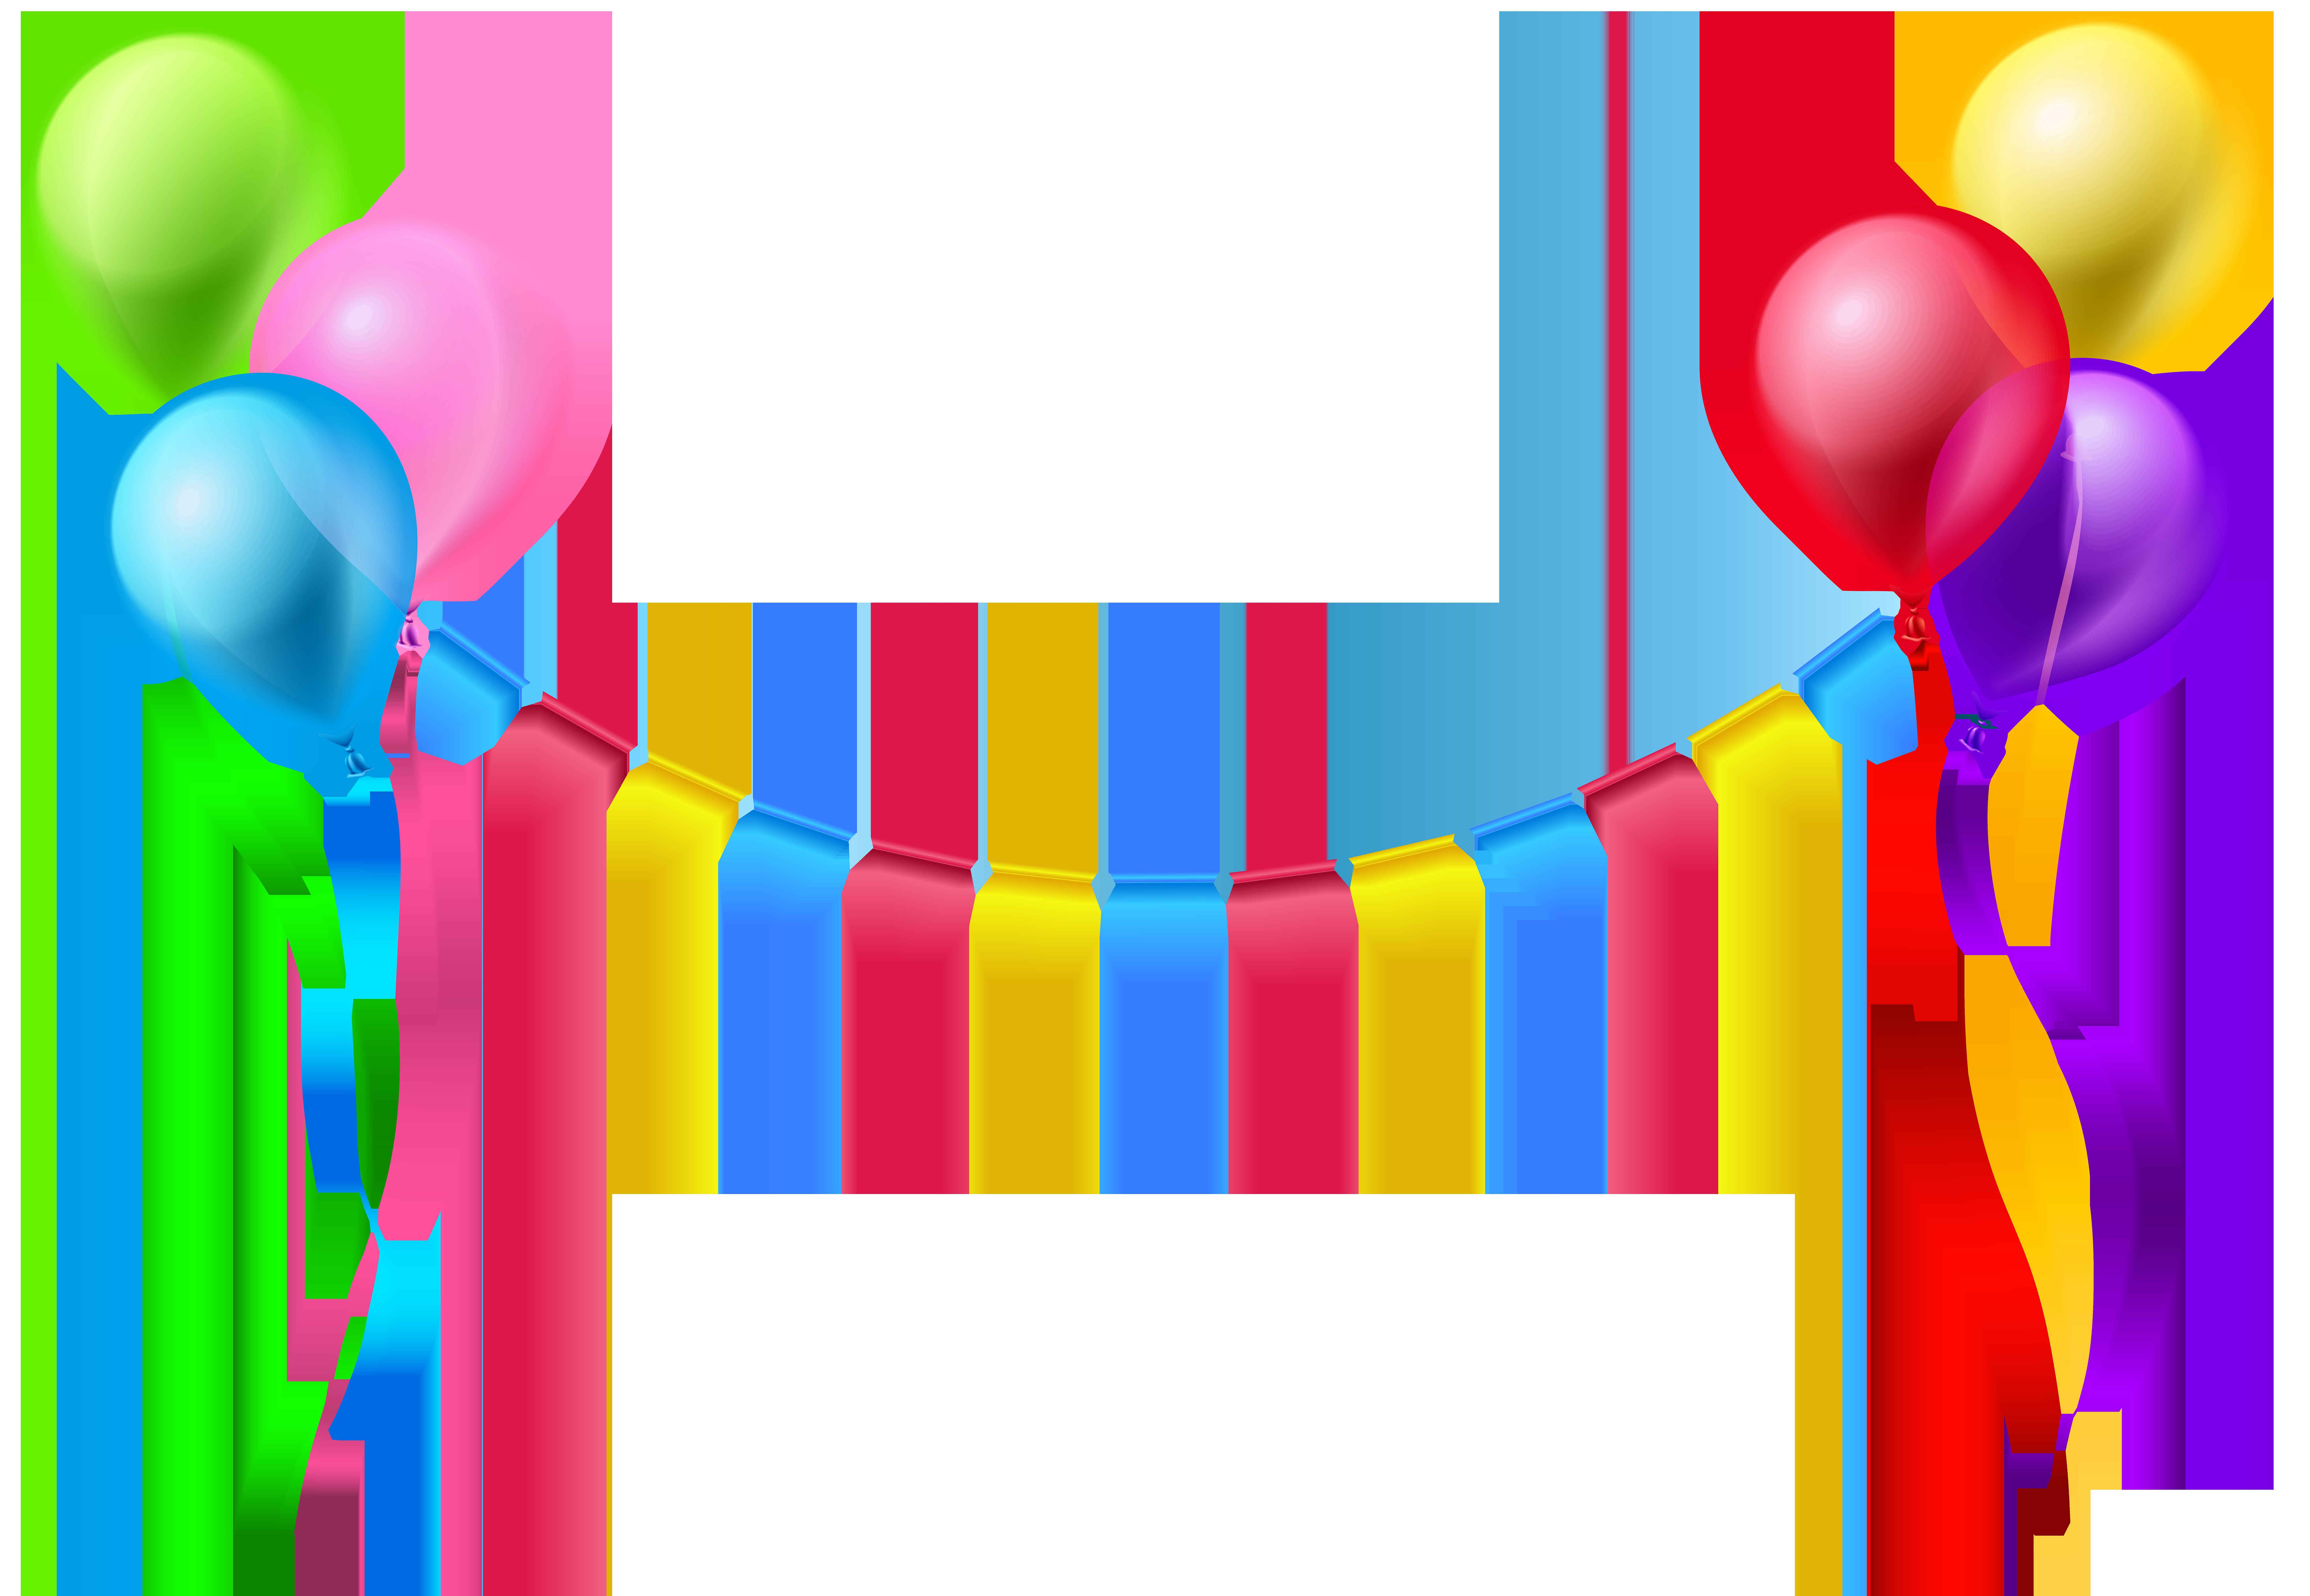 Birthday streamer. Pin by raquel ramirez